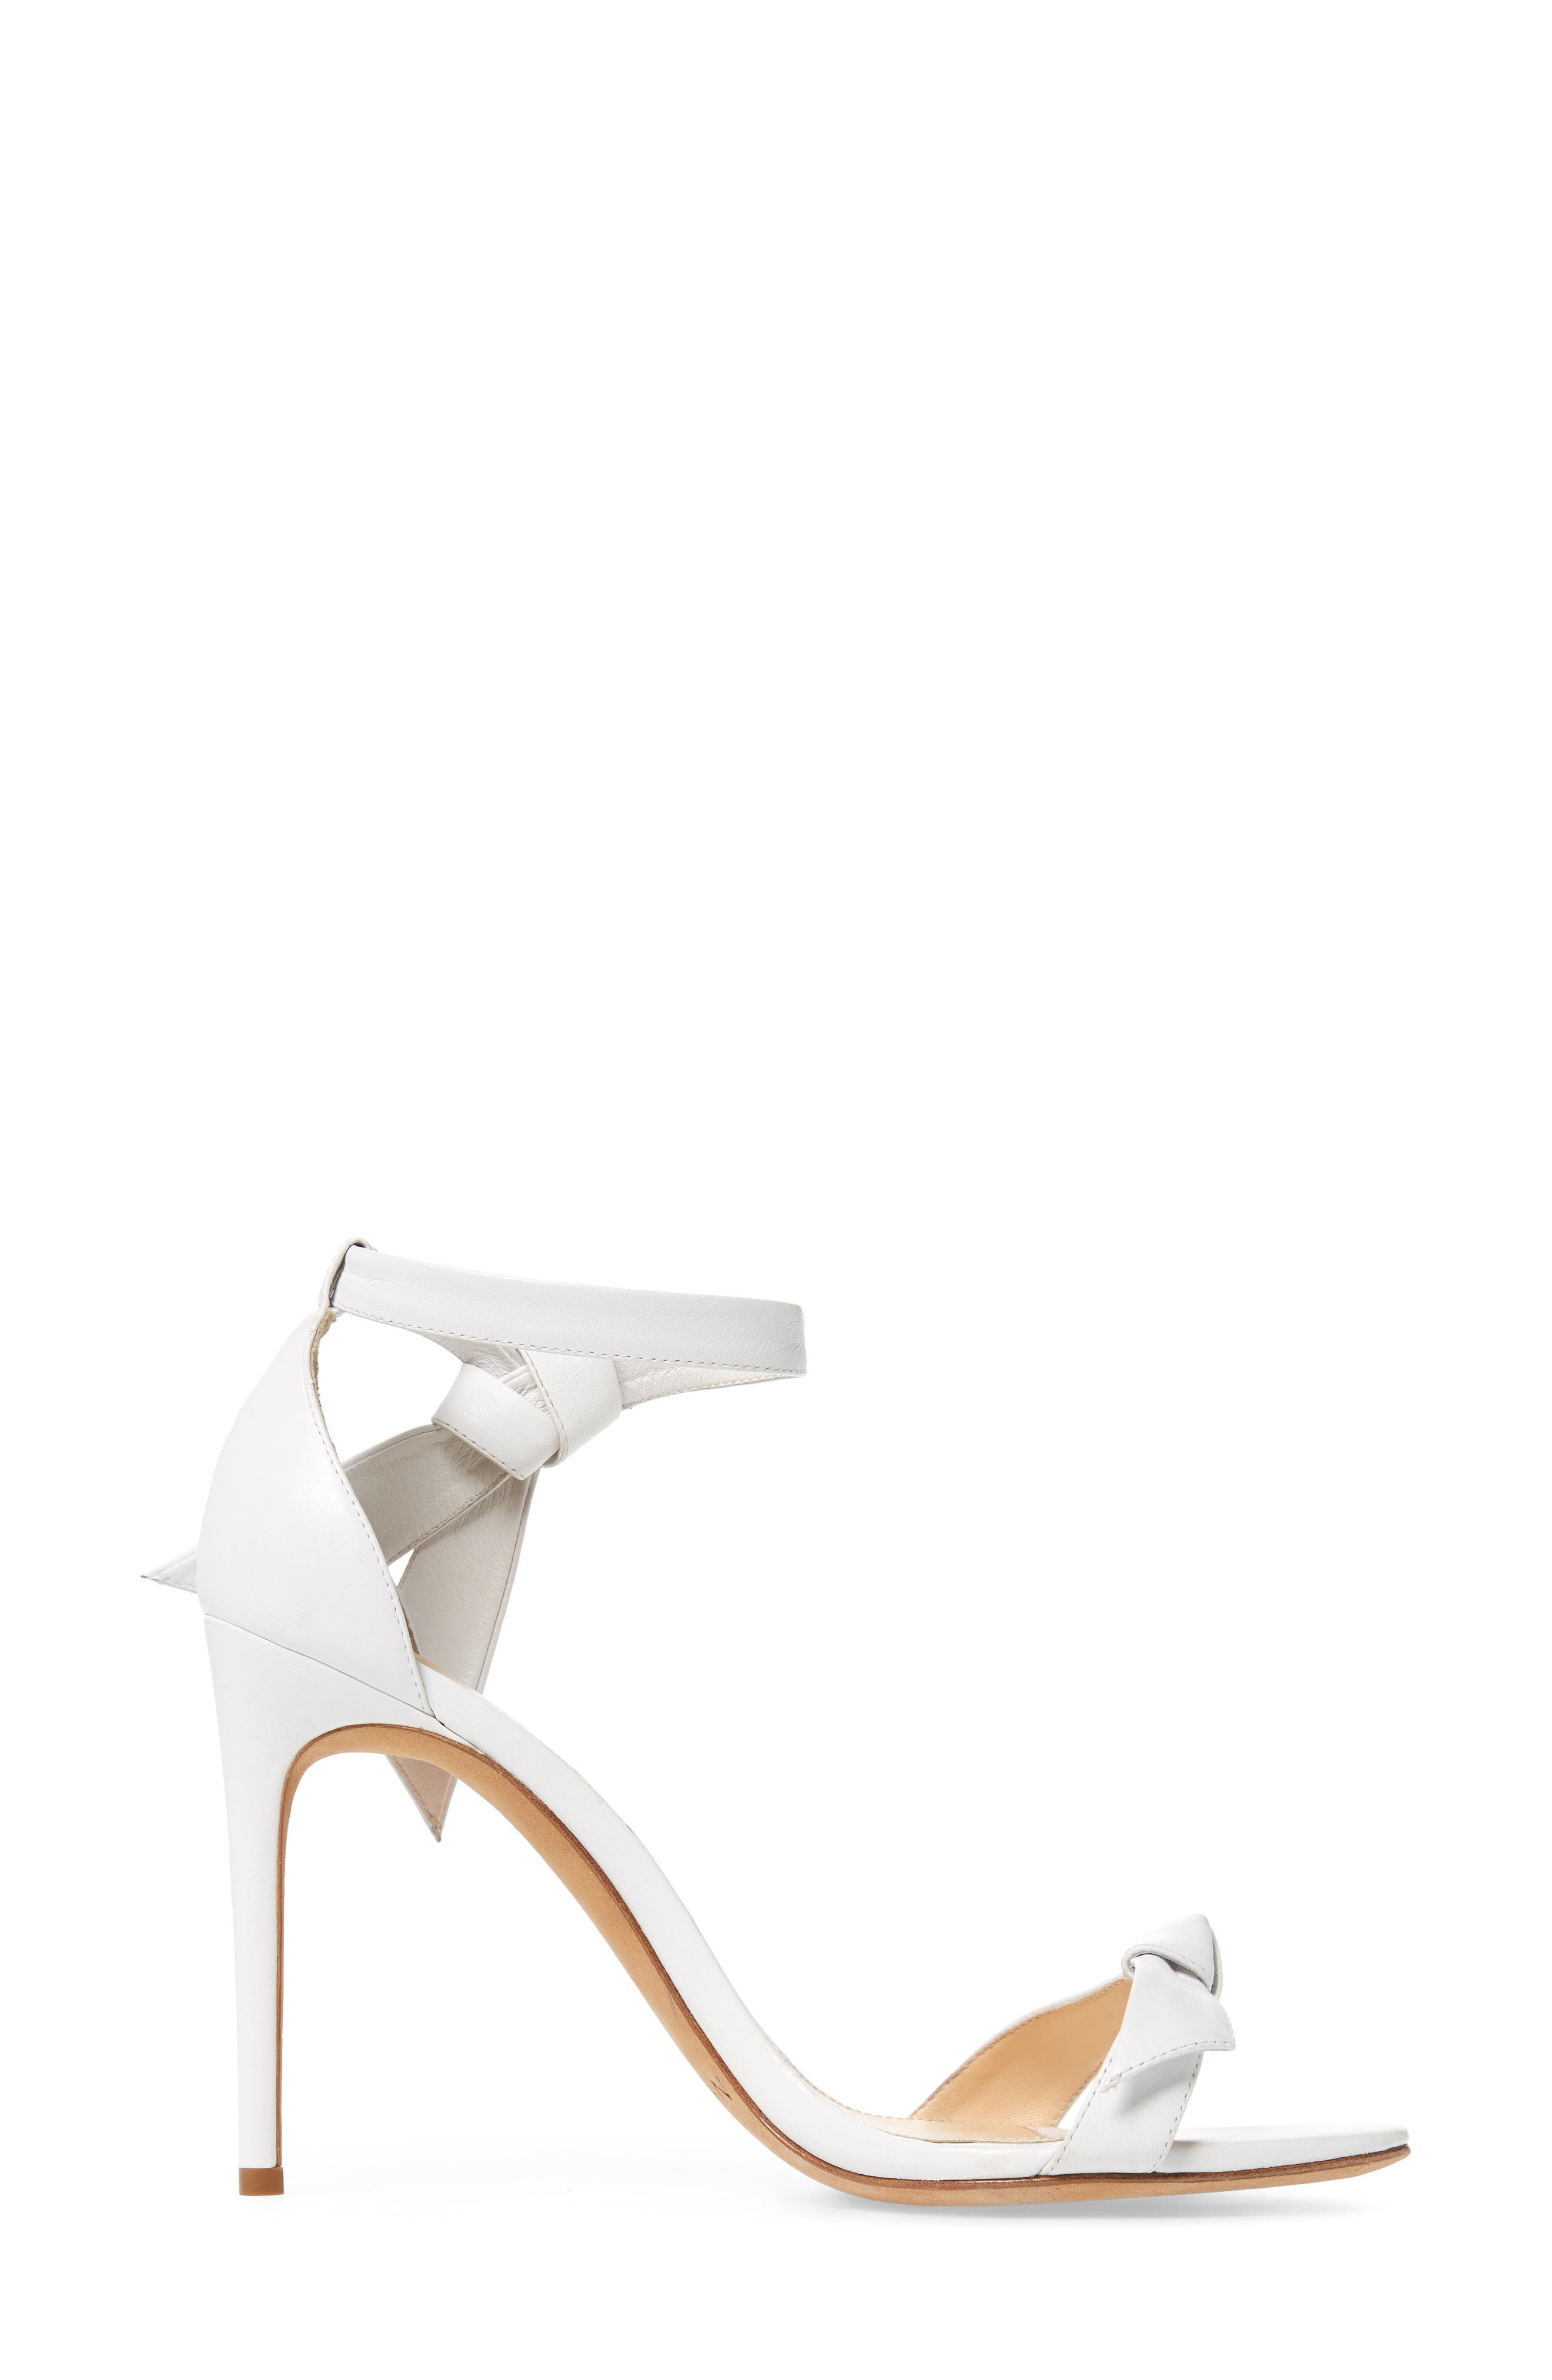 'Clarita' Ankle Tie Sandal,                             Alternate thumbnail 3, color,                             WHITE LEATHER